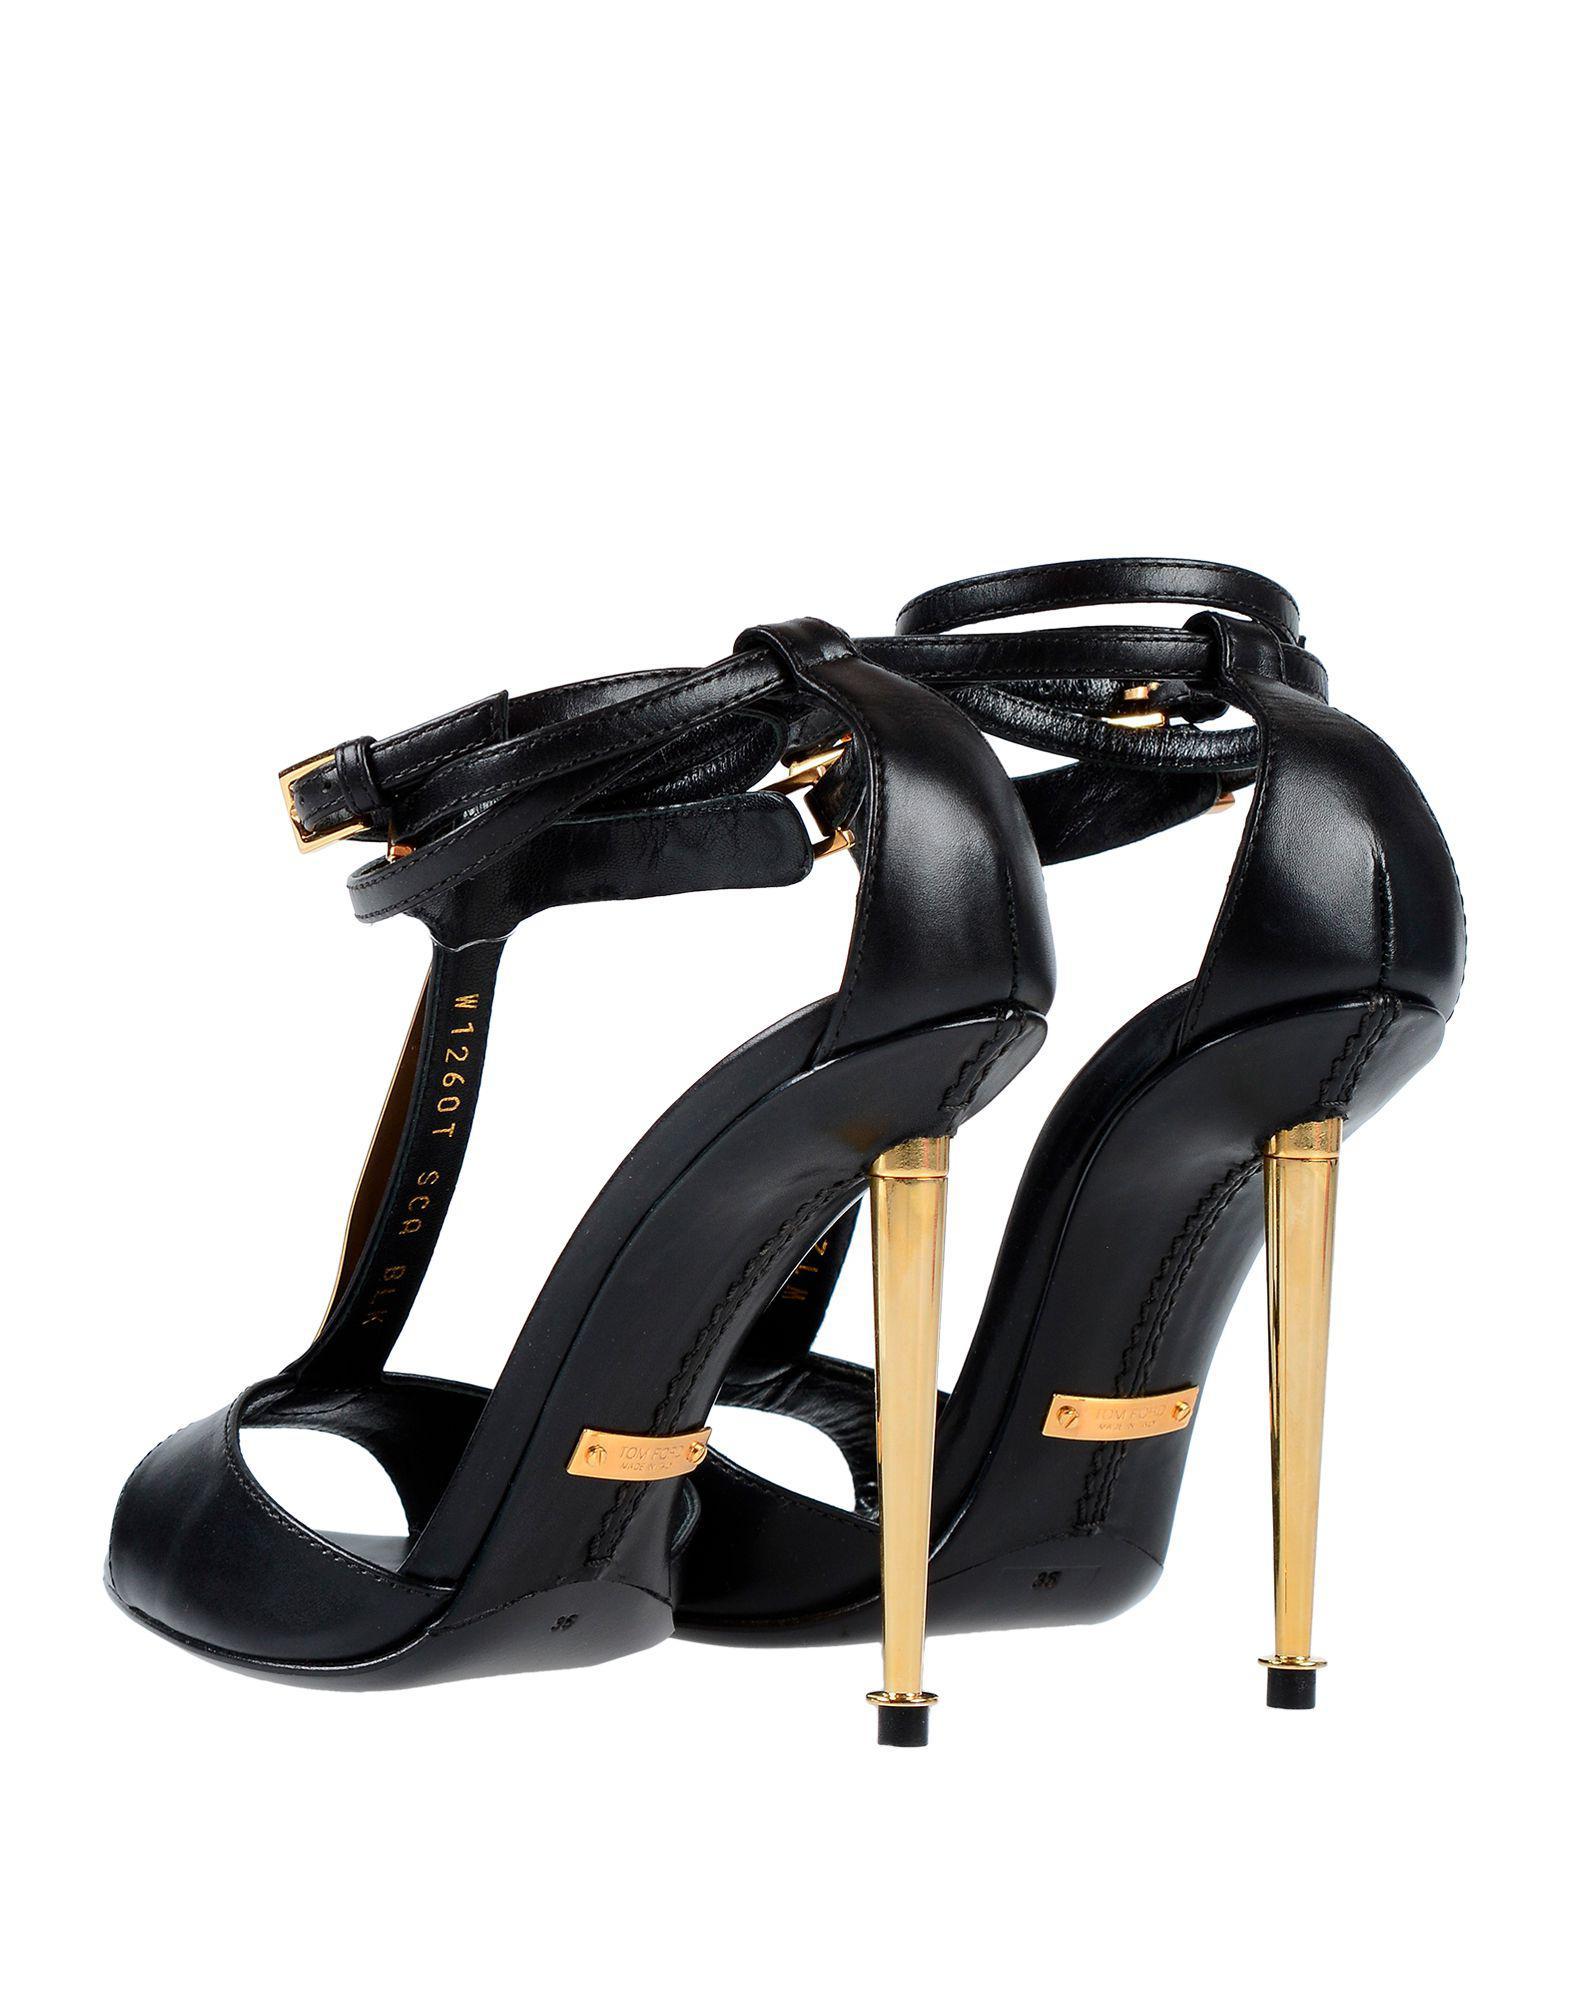 037f52f9129b Lyst - Tom Ford Sandals in Black